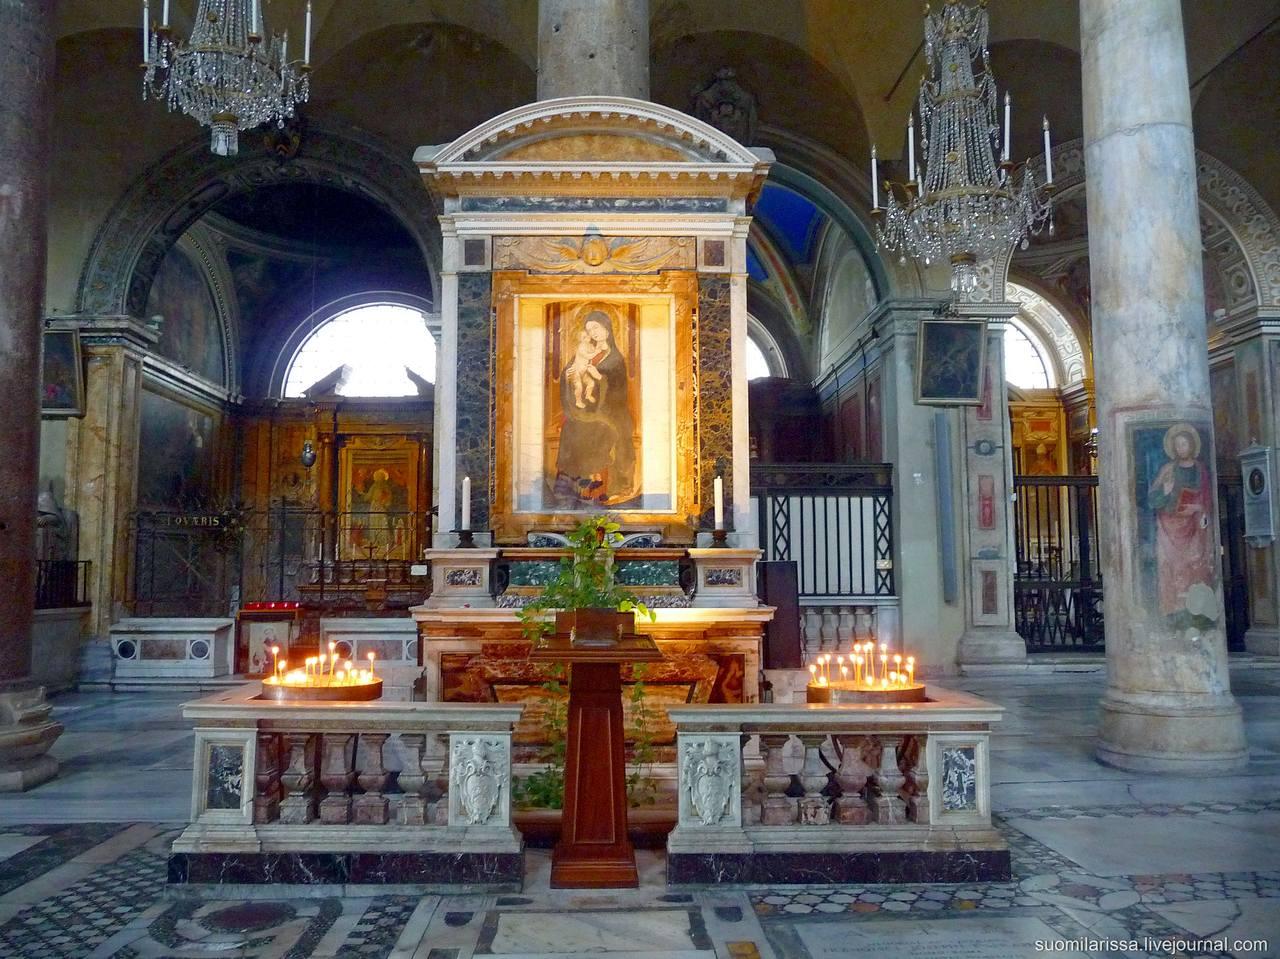 Chiesa S. Maria in Aracoeli (1)